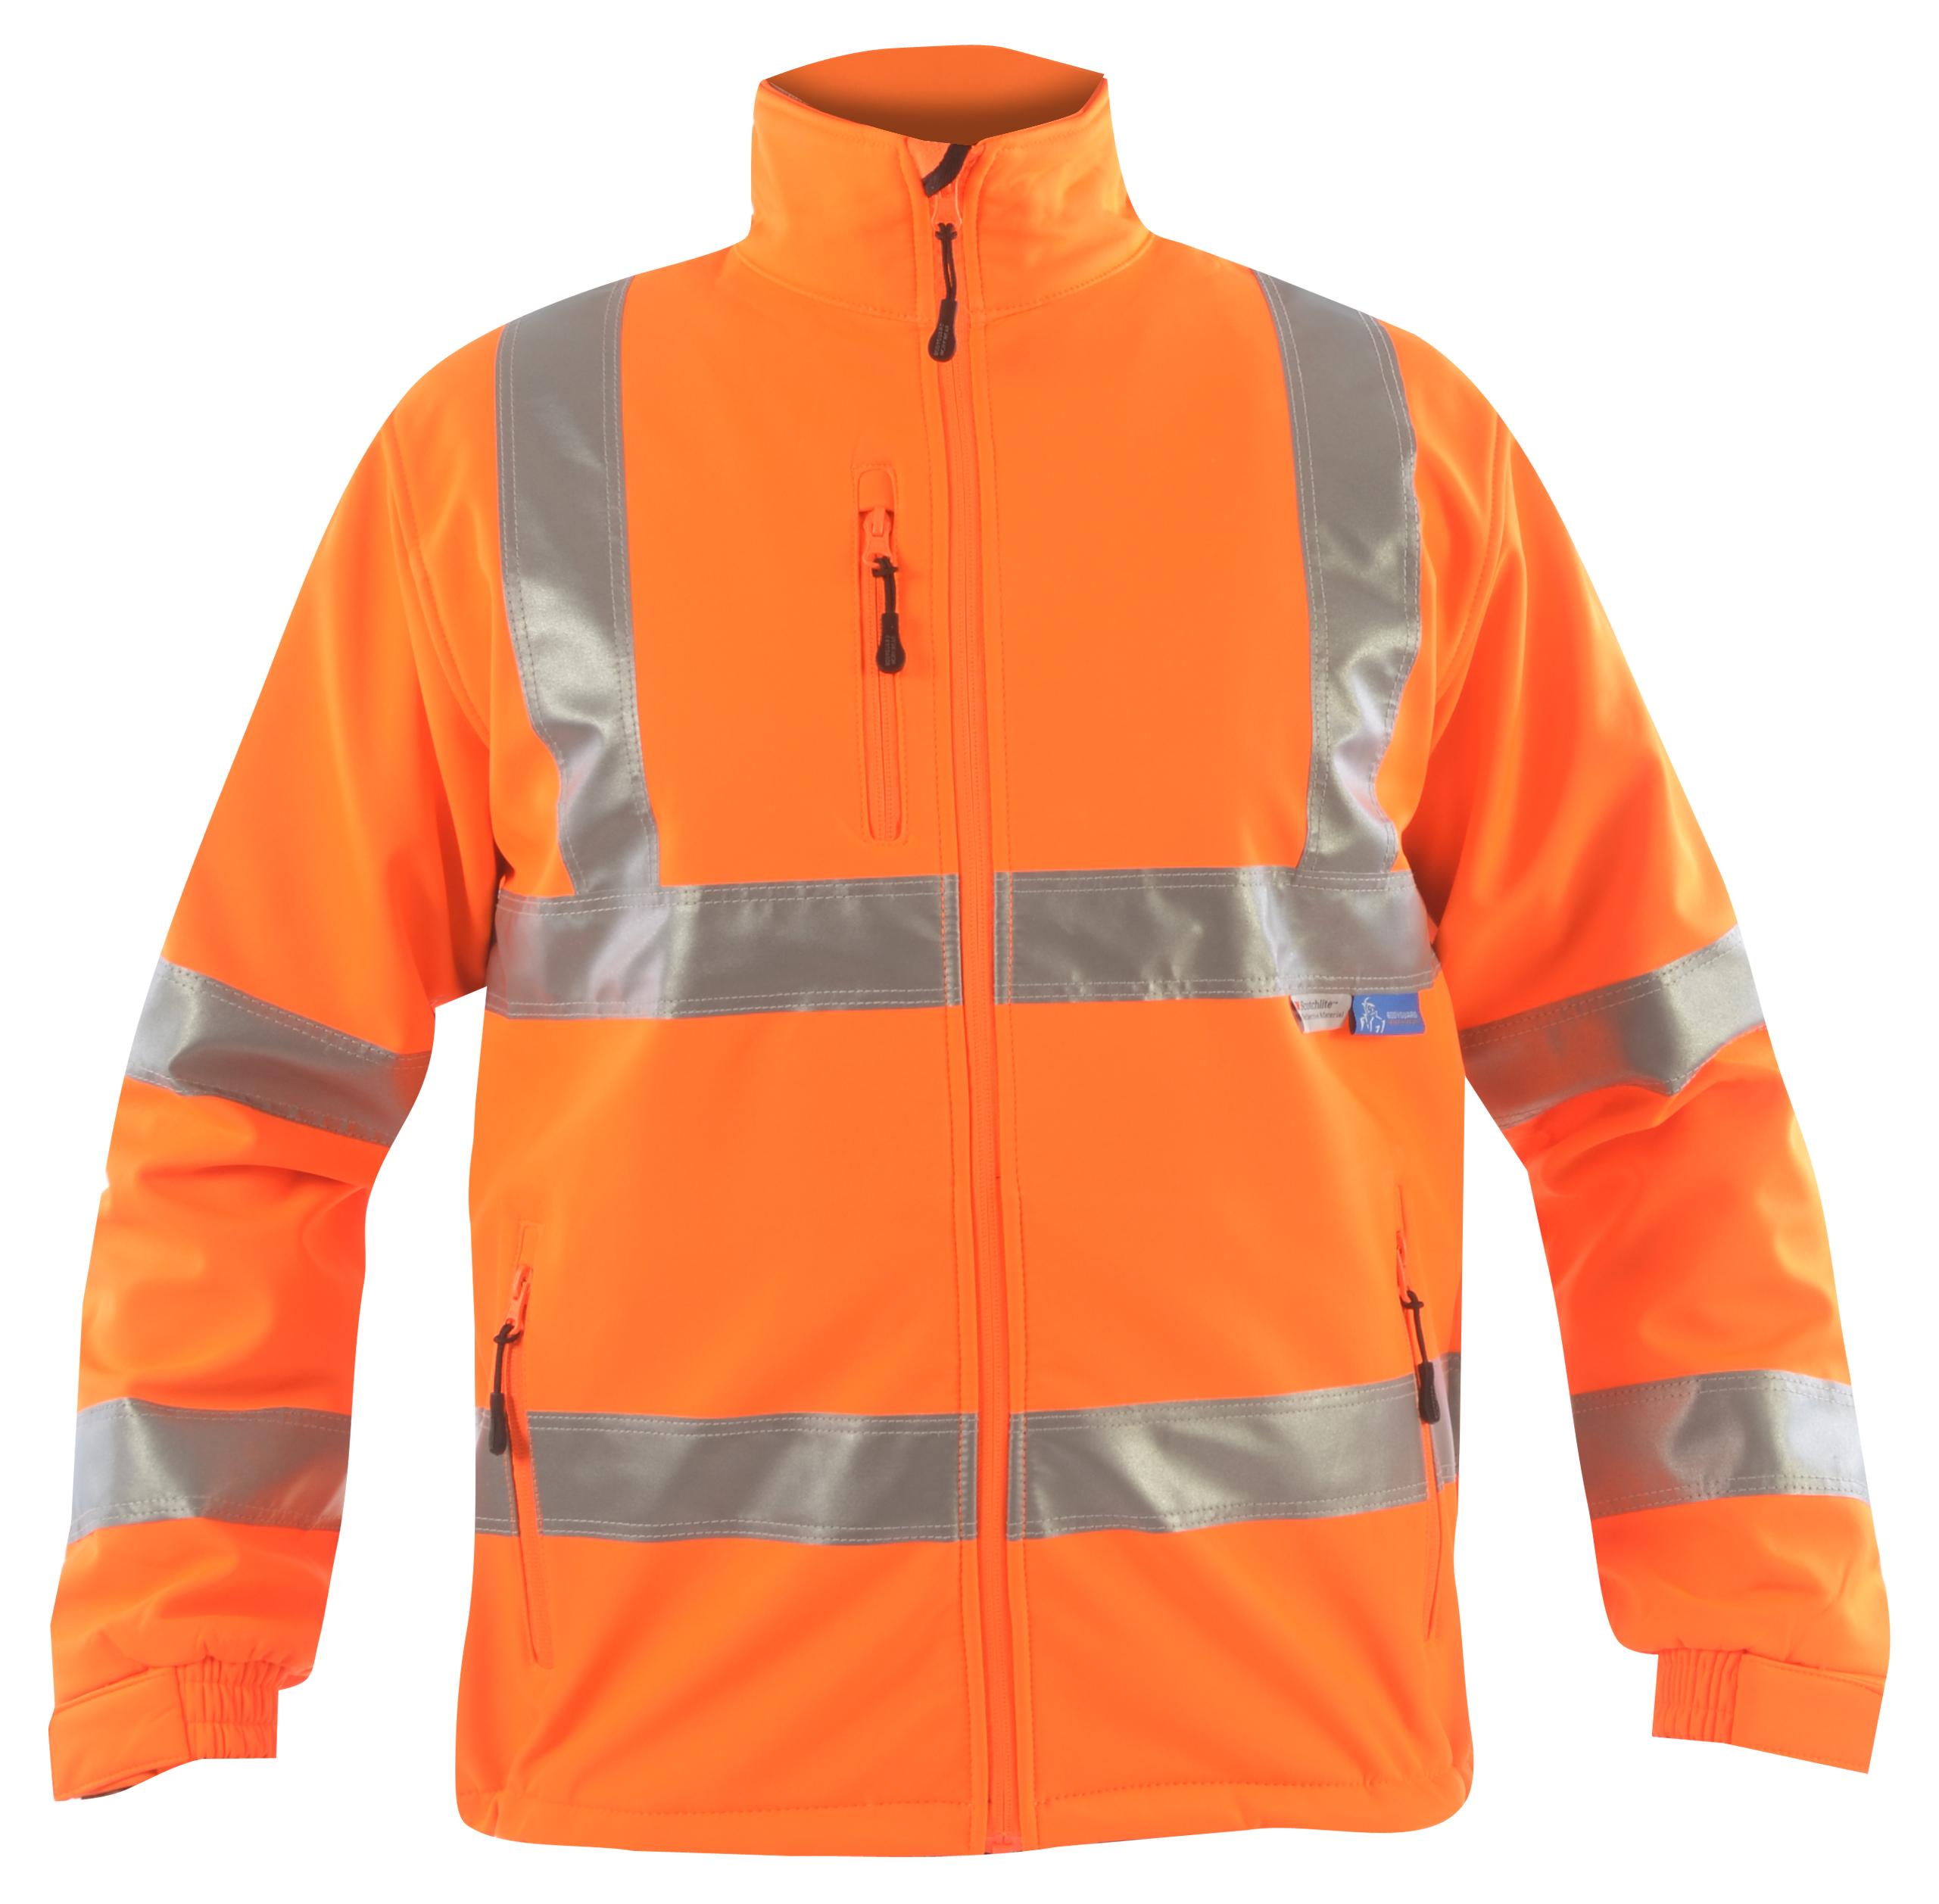 bodyguard-Softshell-Bodyguard-Workwear-Hi-Viz-GO/RT-Softshell